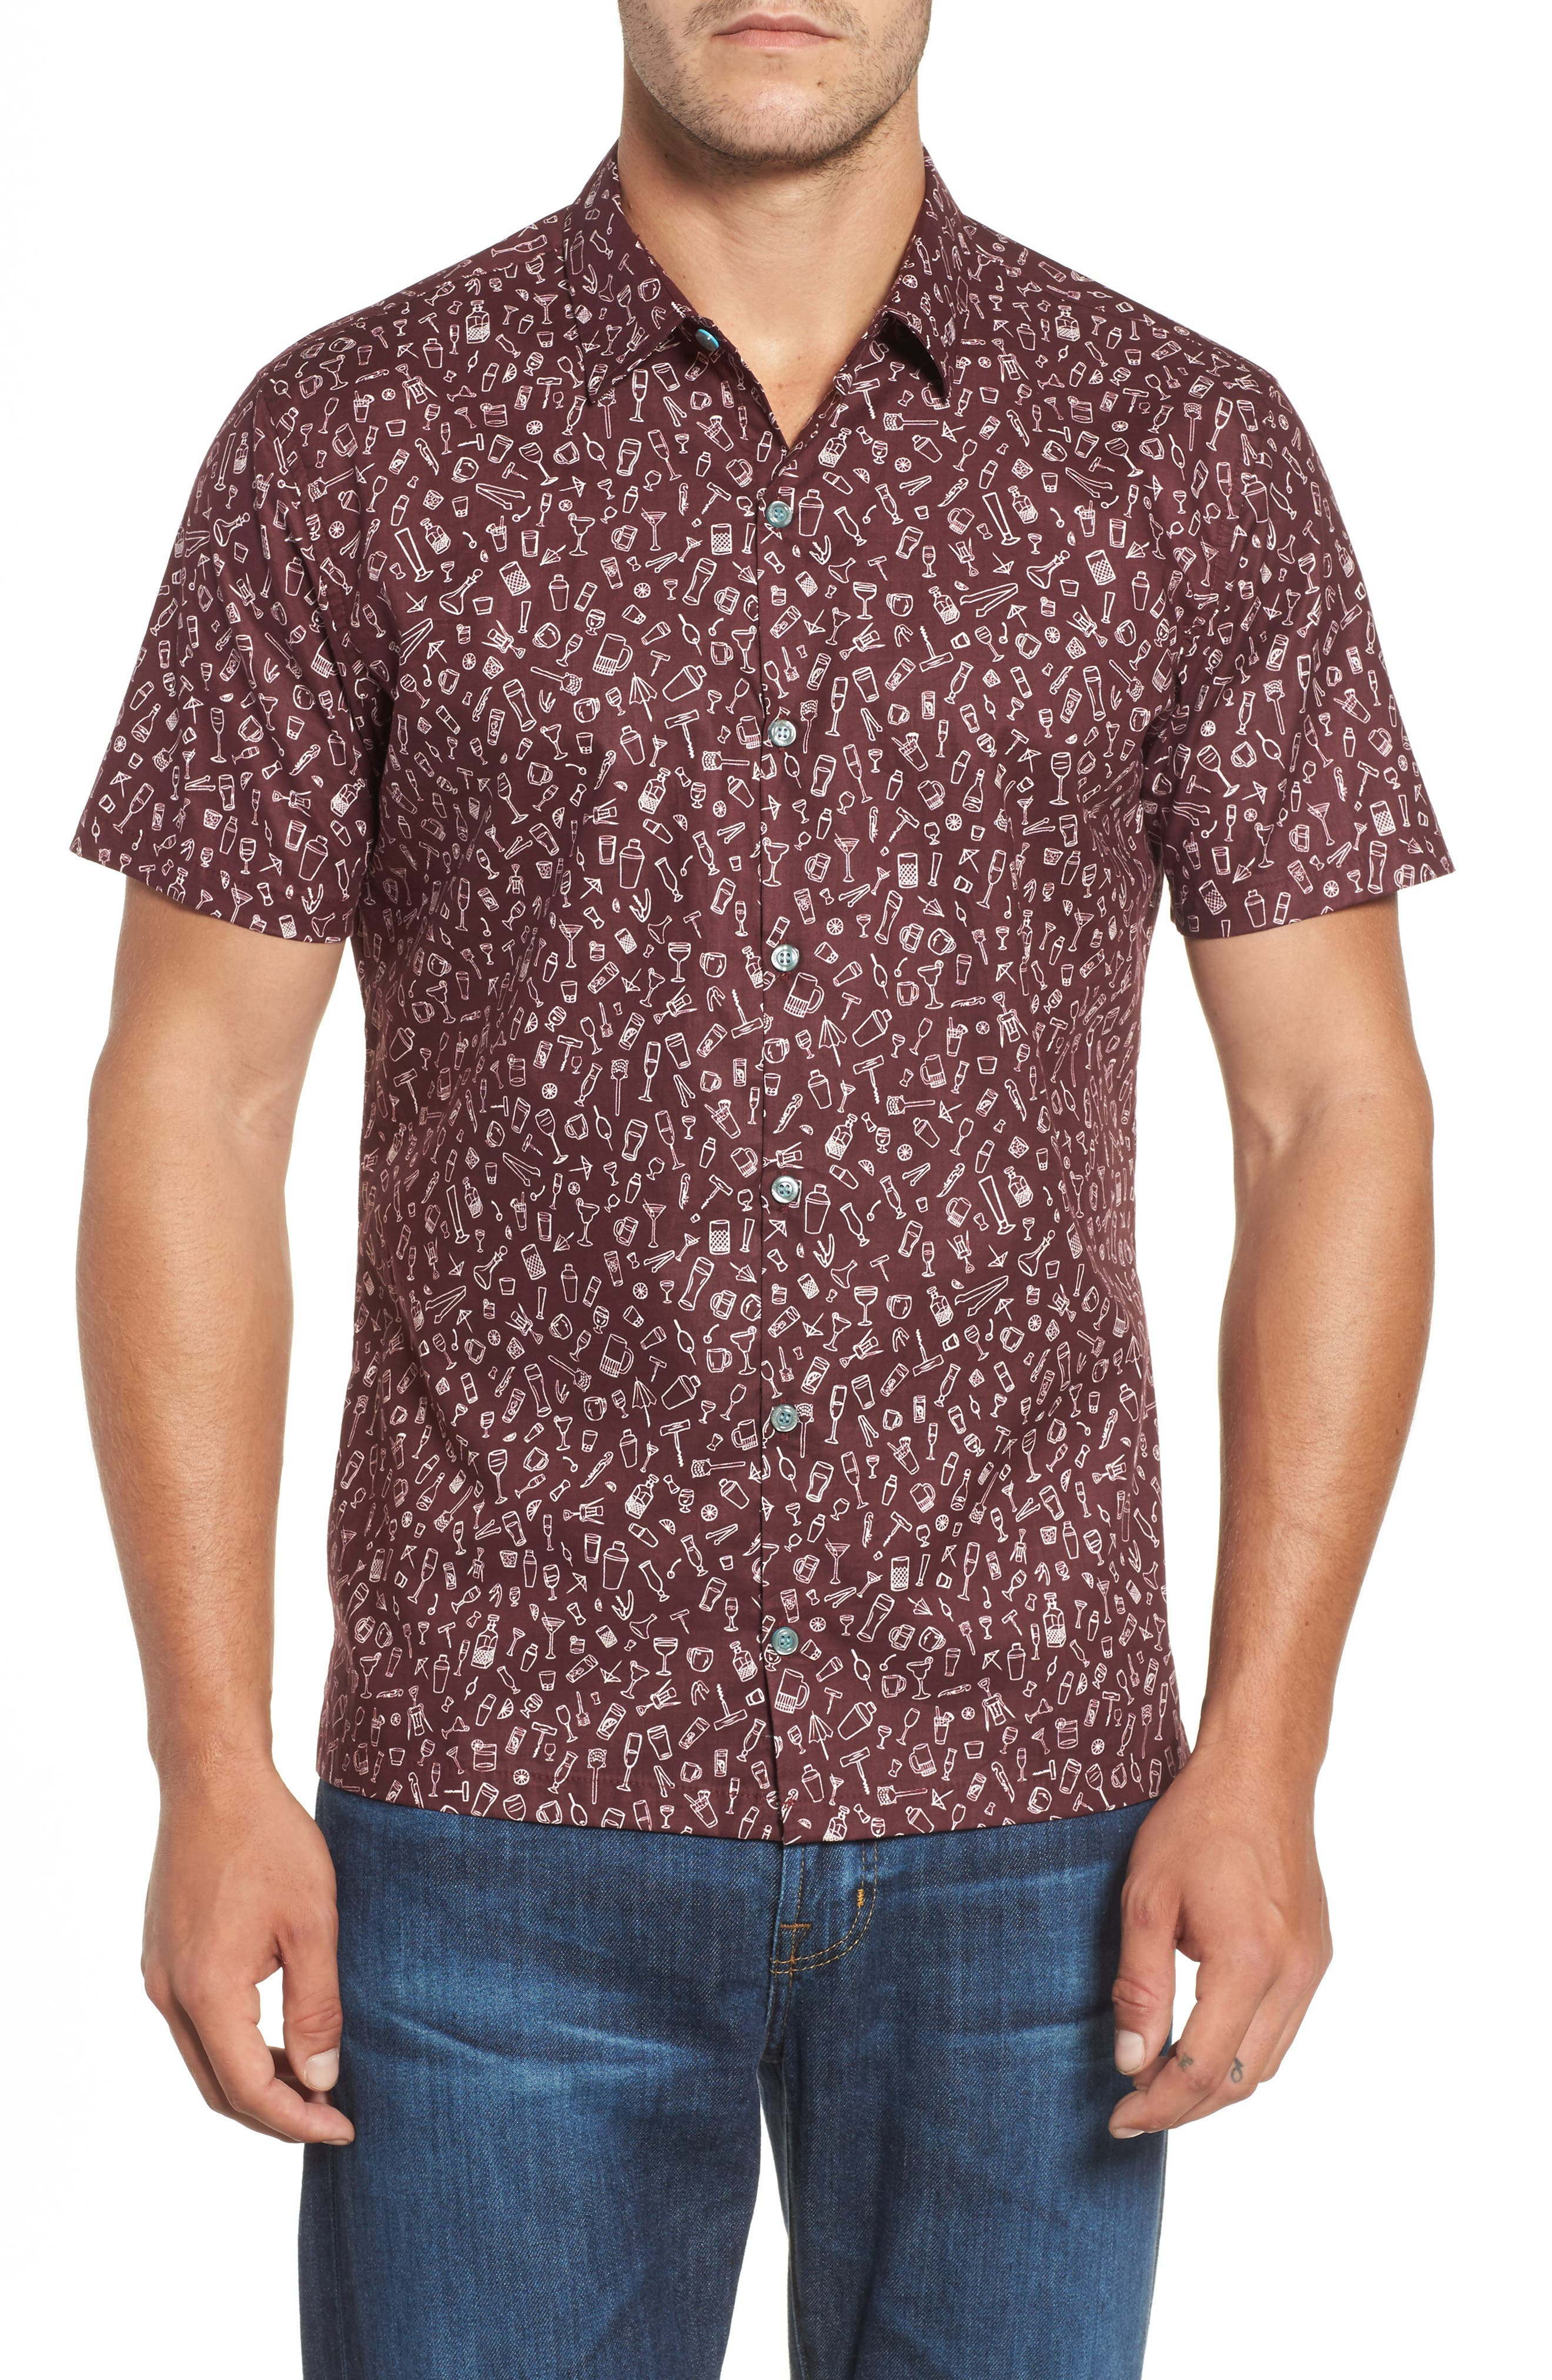 5 PM Slim Fit Camp Shirt,                             Main thumbnail 1, color,                             600